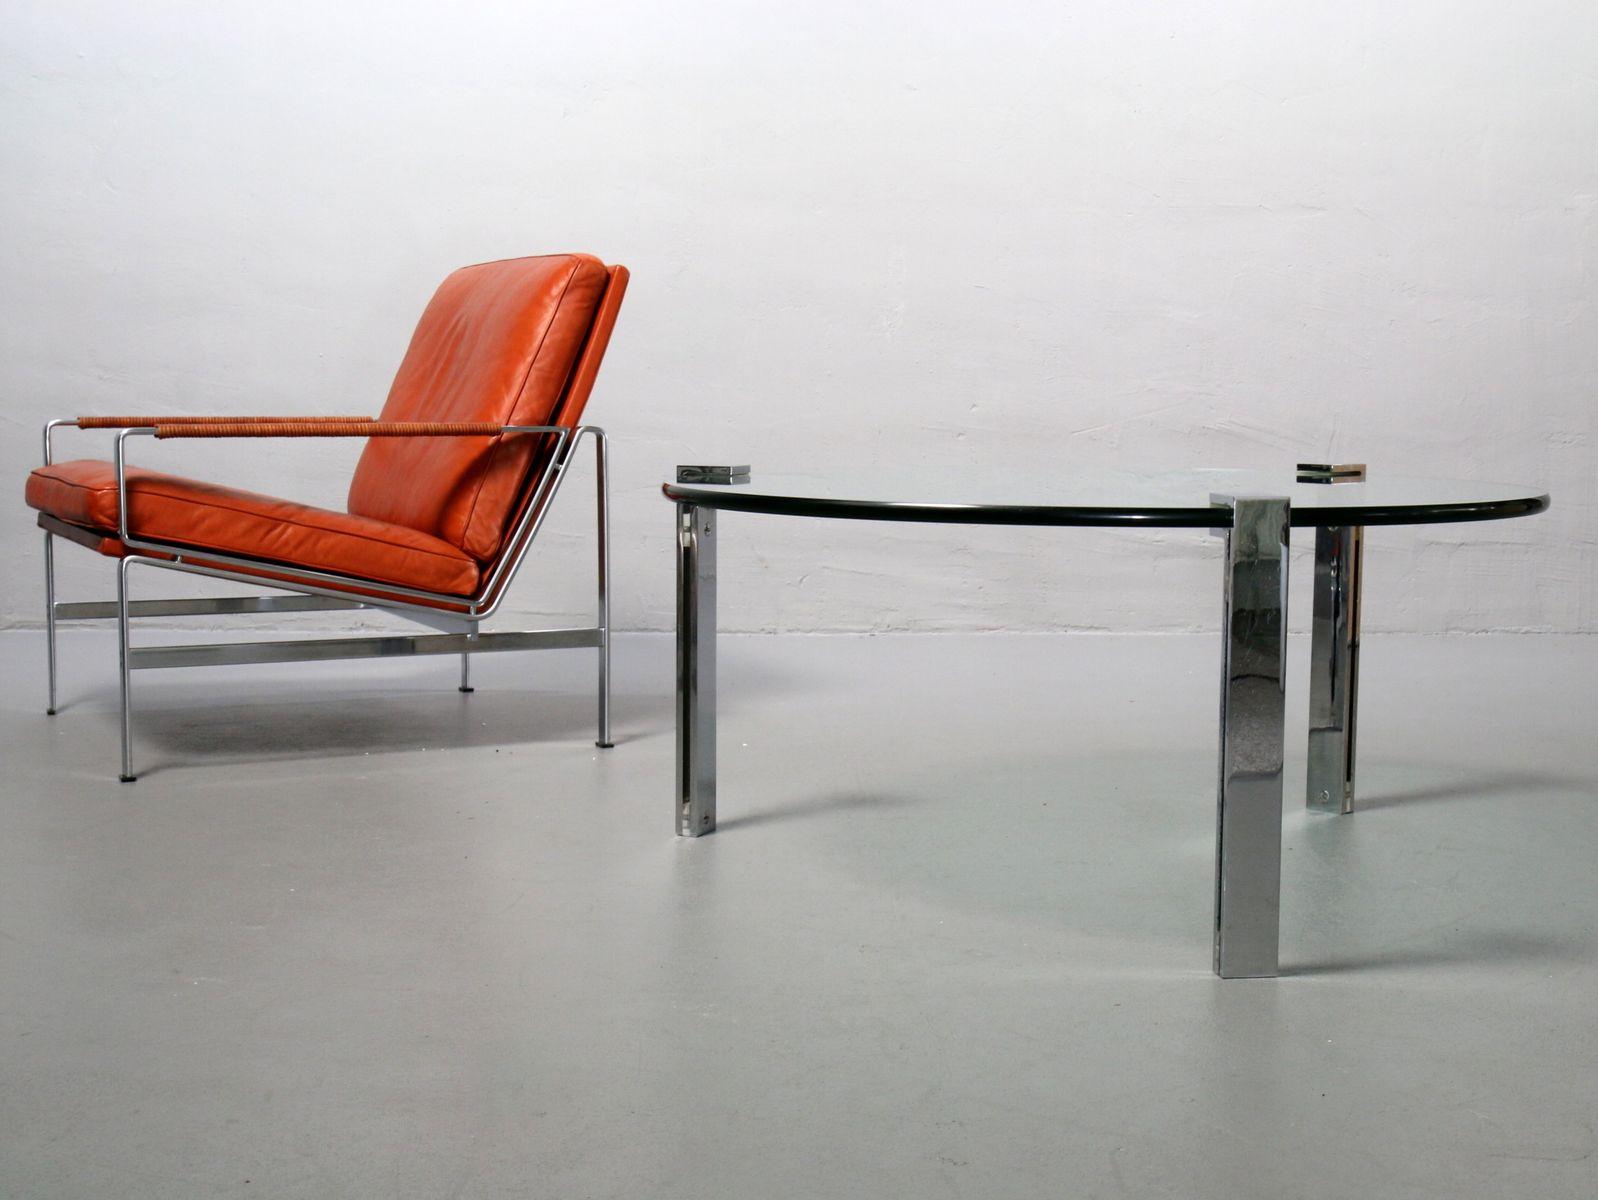 table basse vintage en verre en vente sur pamono. Black Bedroom Furniture Sets. Home Design Ideas